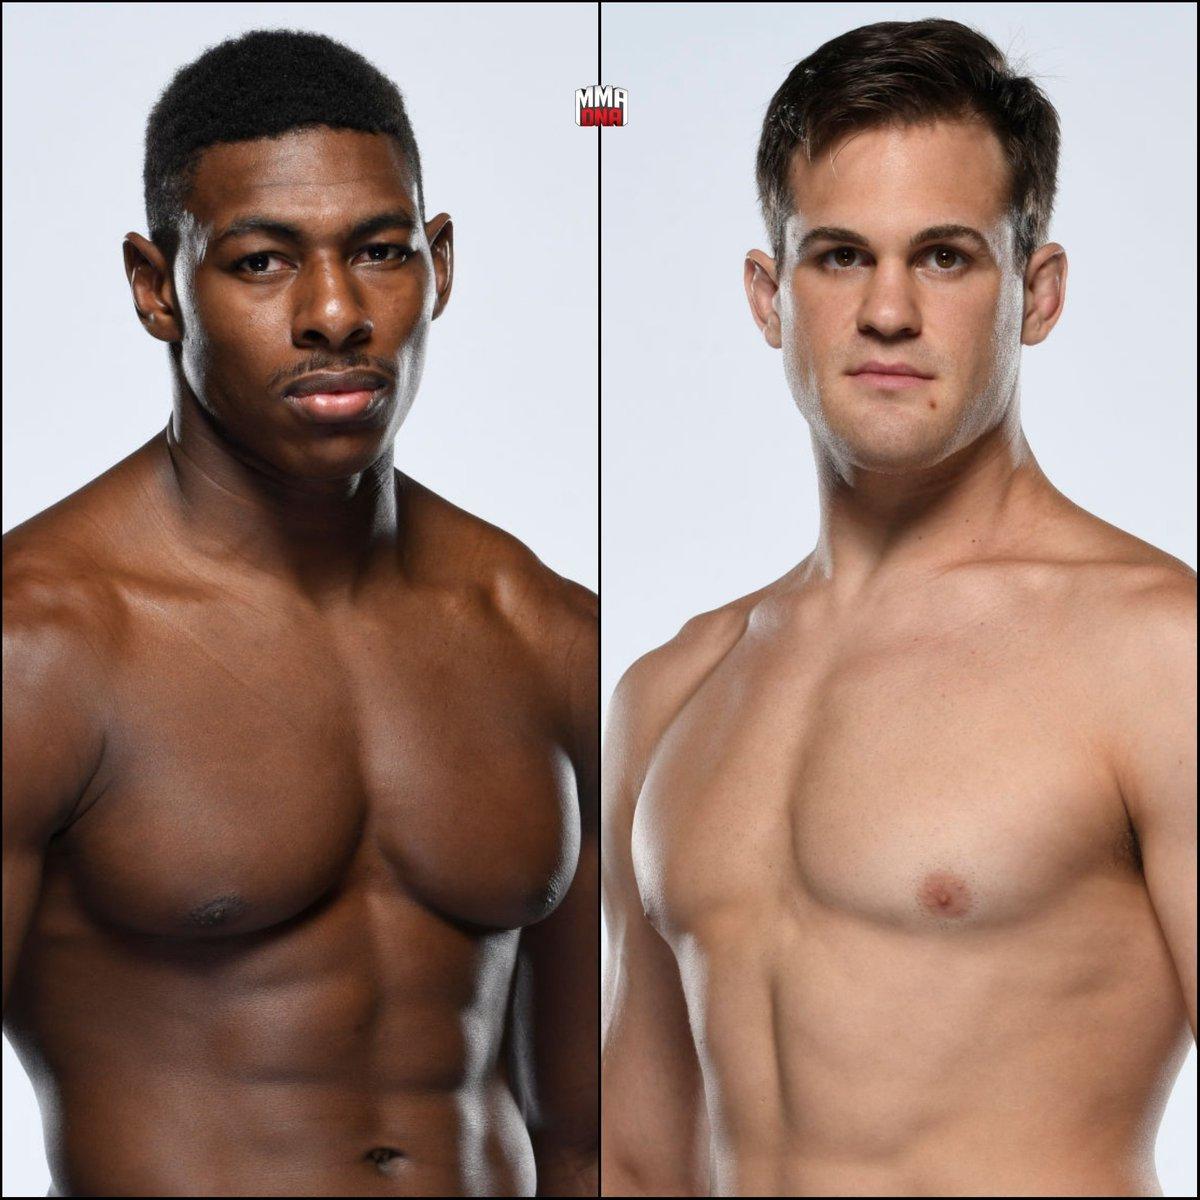 Joaquin Buckley will fight Jordan Wright at #UFC255 on November 21st. (per @bokamotoESPN) #UFC #MMA #UFCESPN https://t.co/TOp1uPNpmw